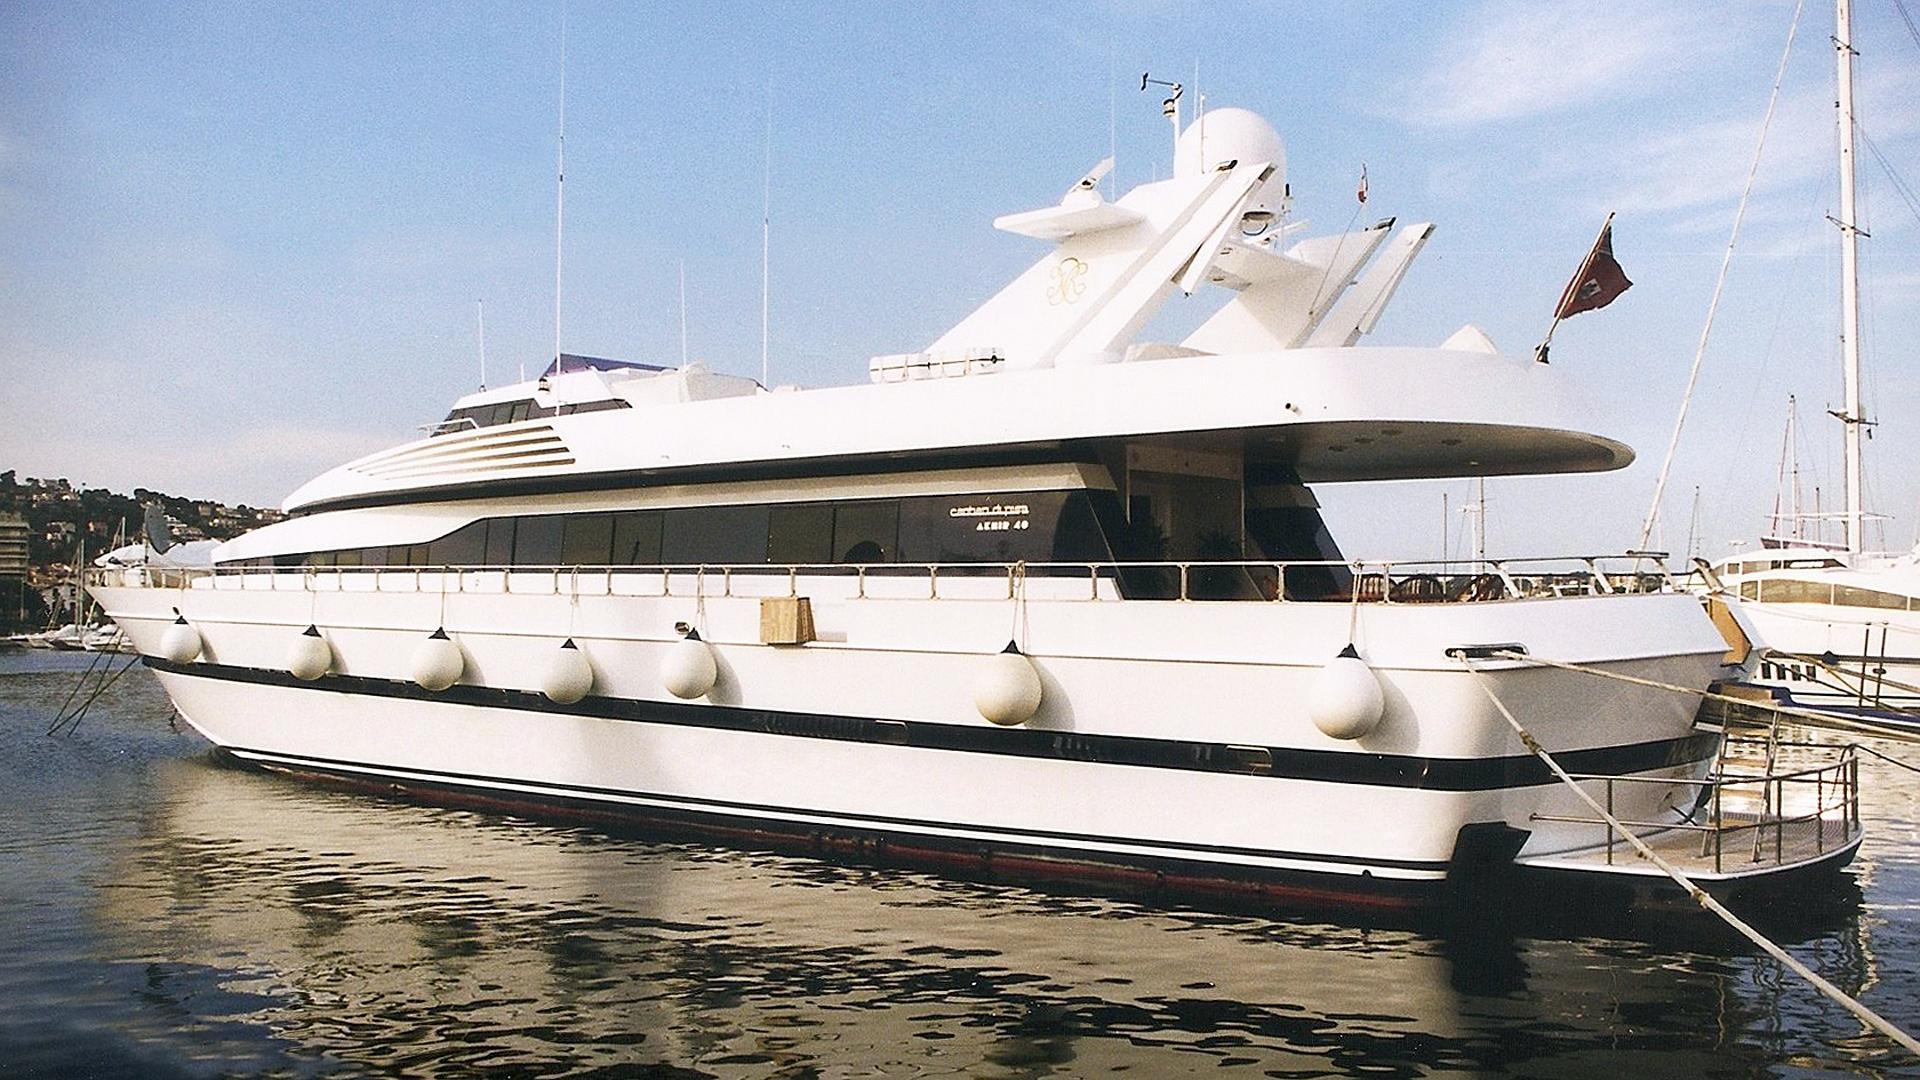 whispers-motor-yacht-cantieri-di-pisa-akhir-40-1984-38m-stern-profile